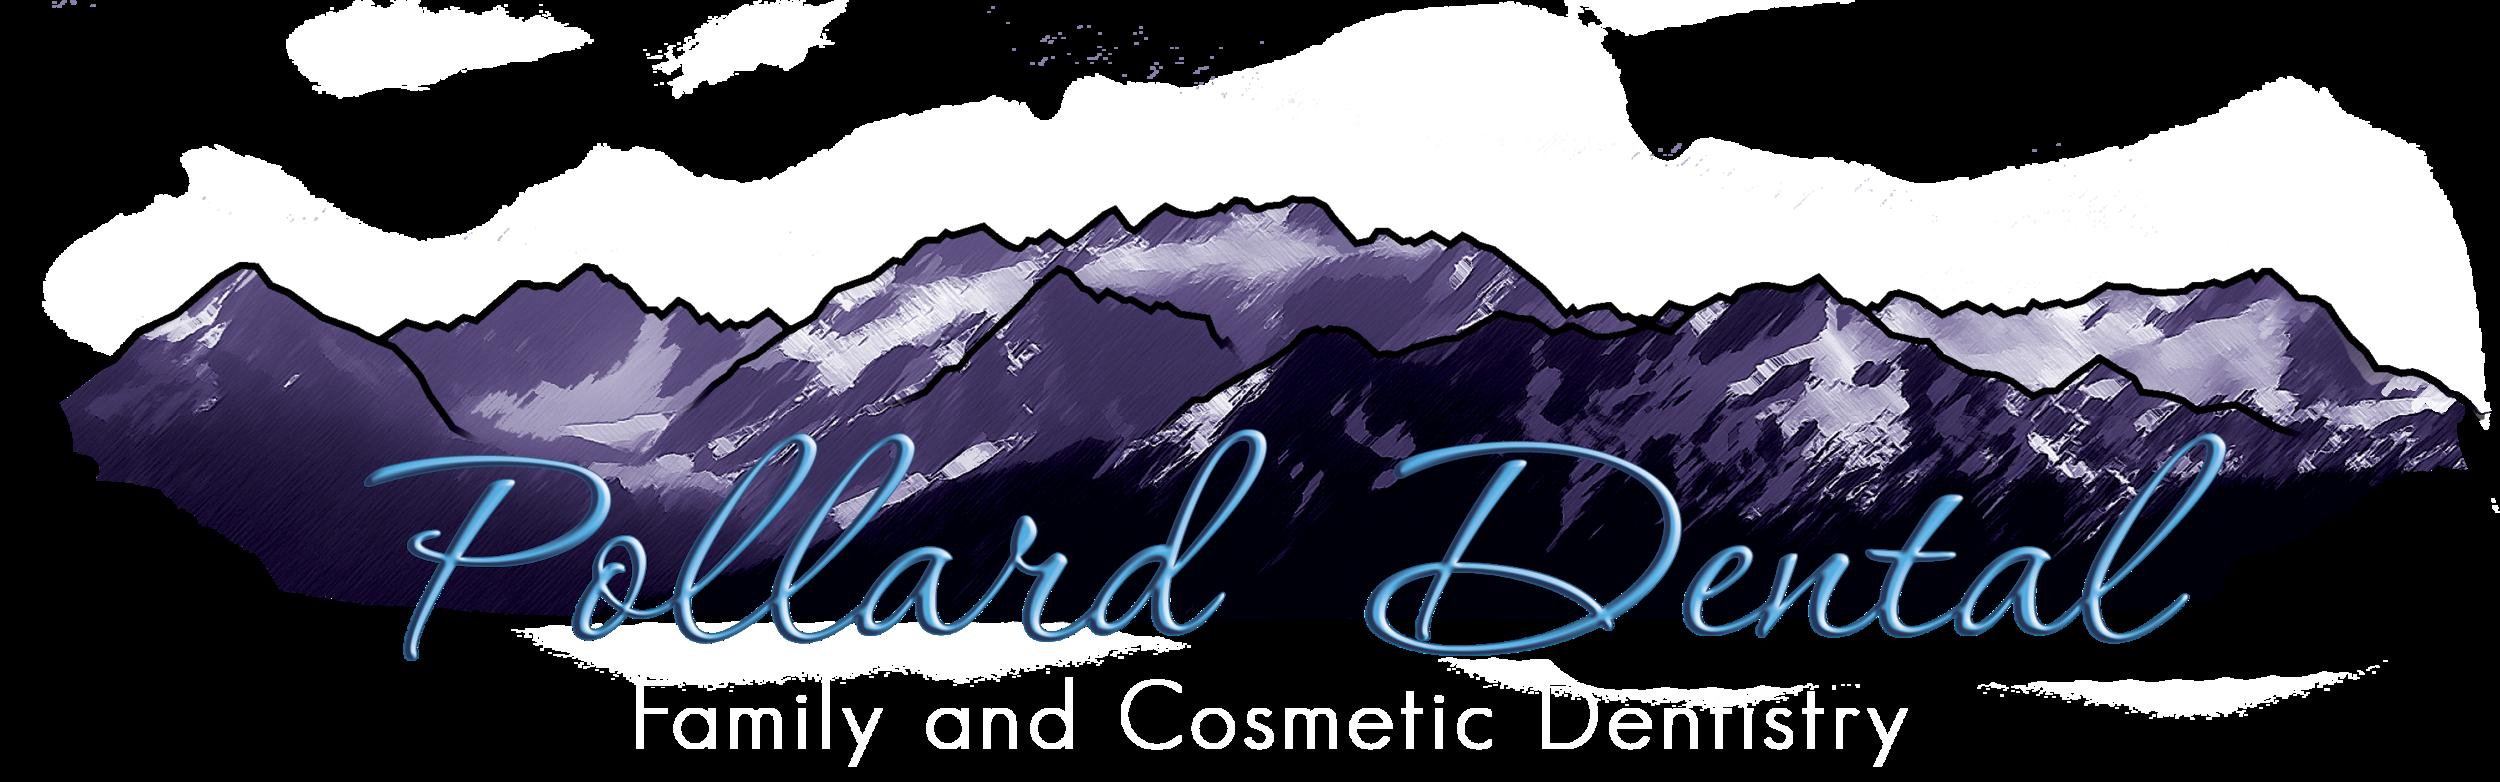 Pollard Dental Logo